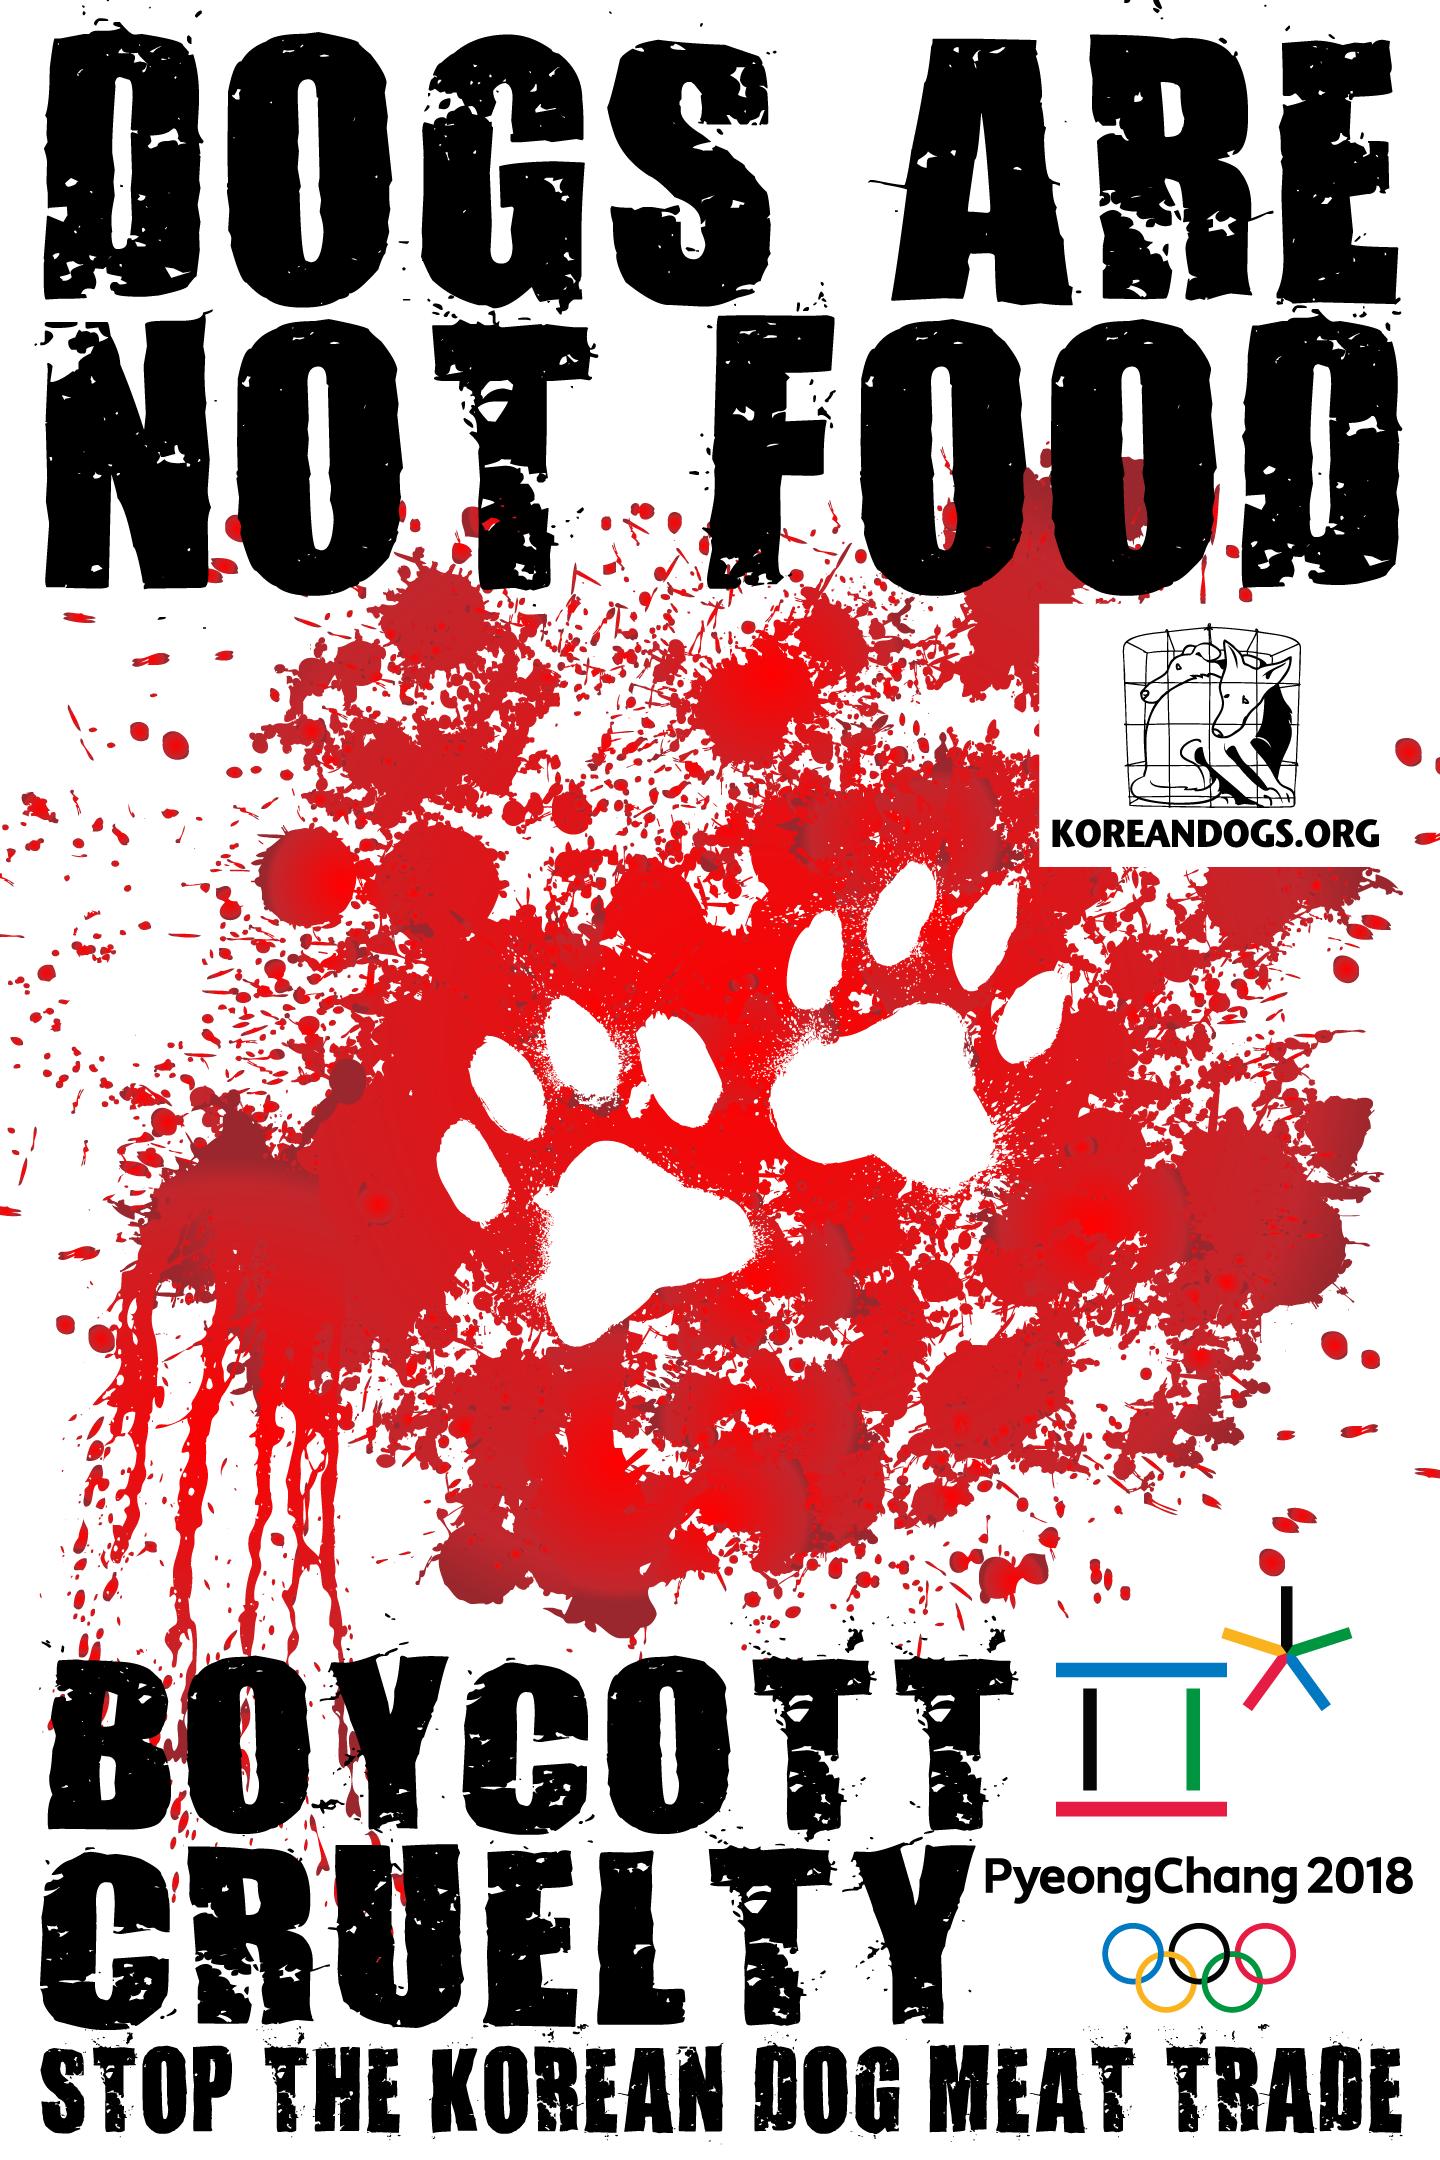 http://koreandogs.org/write-to-ioc/?utm_source=sendinblue&utm_campaign=One_Click__Clock_is_ticking_for_PyeongChang_2018&utm_medium=email